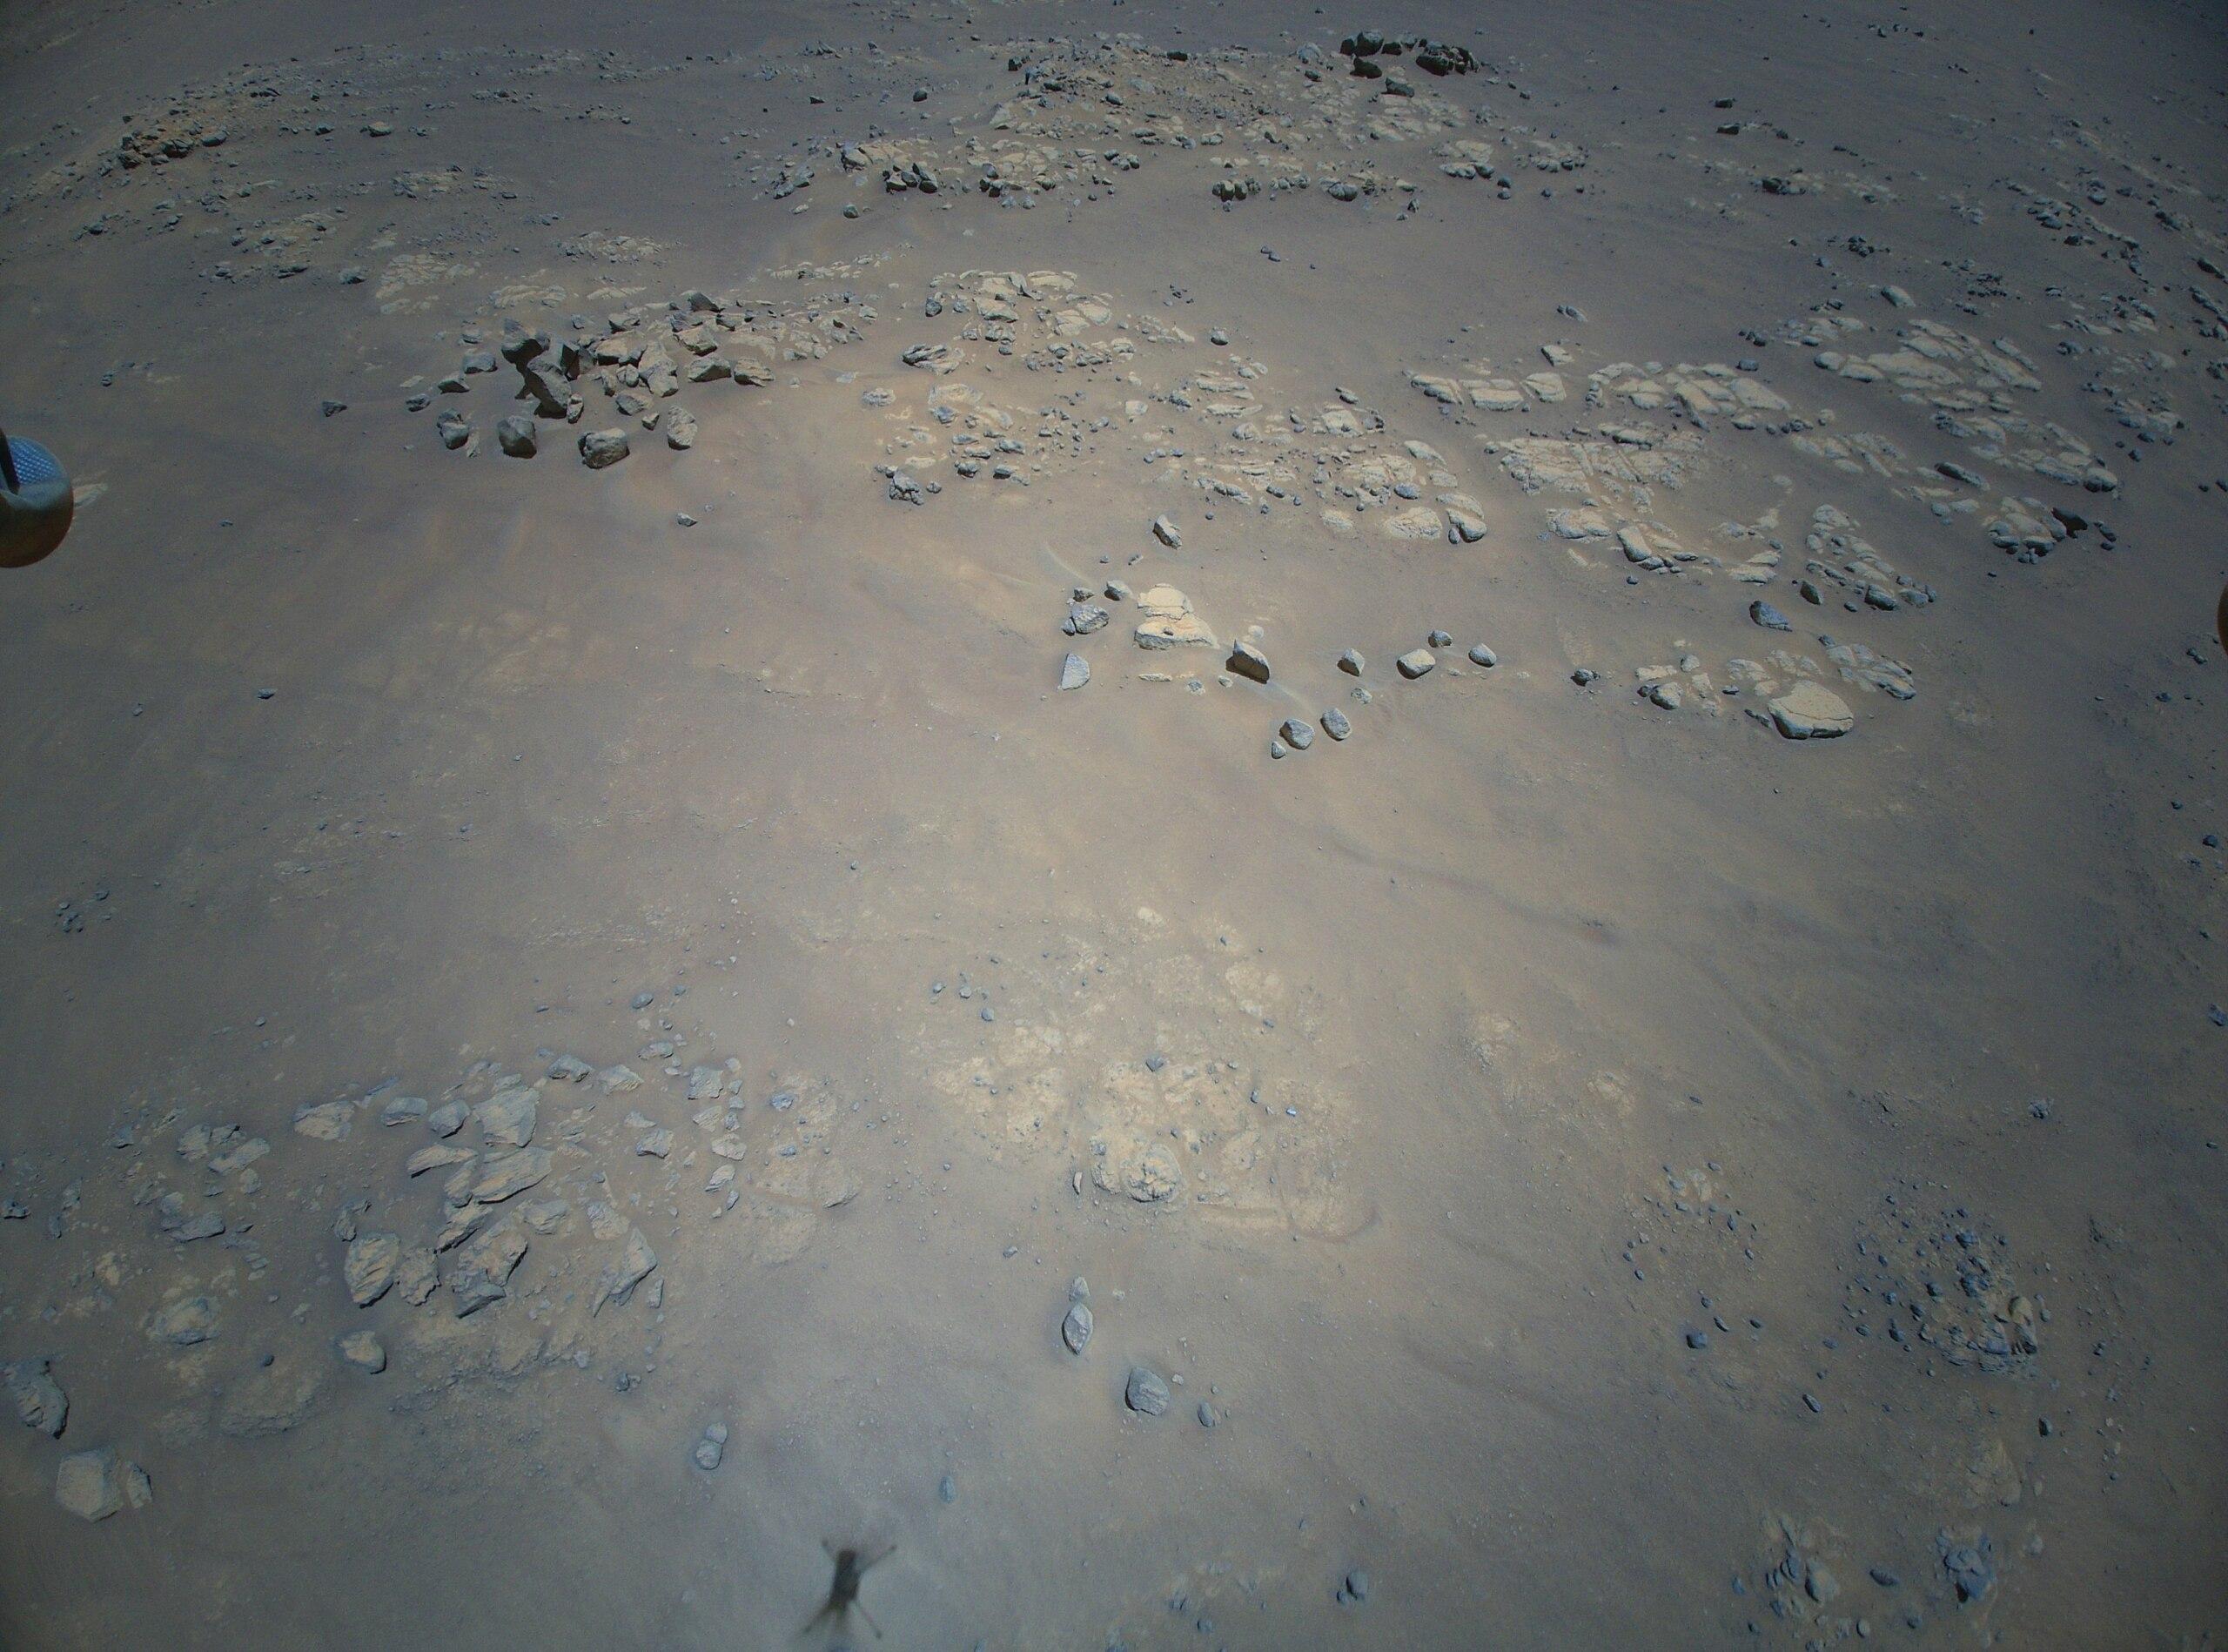 Mars 2020 (Perseverance - Ingenuity) : exploration du cratère Jezero - Page 18 2510